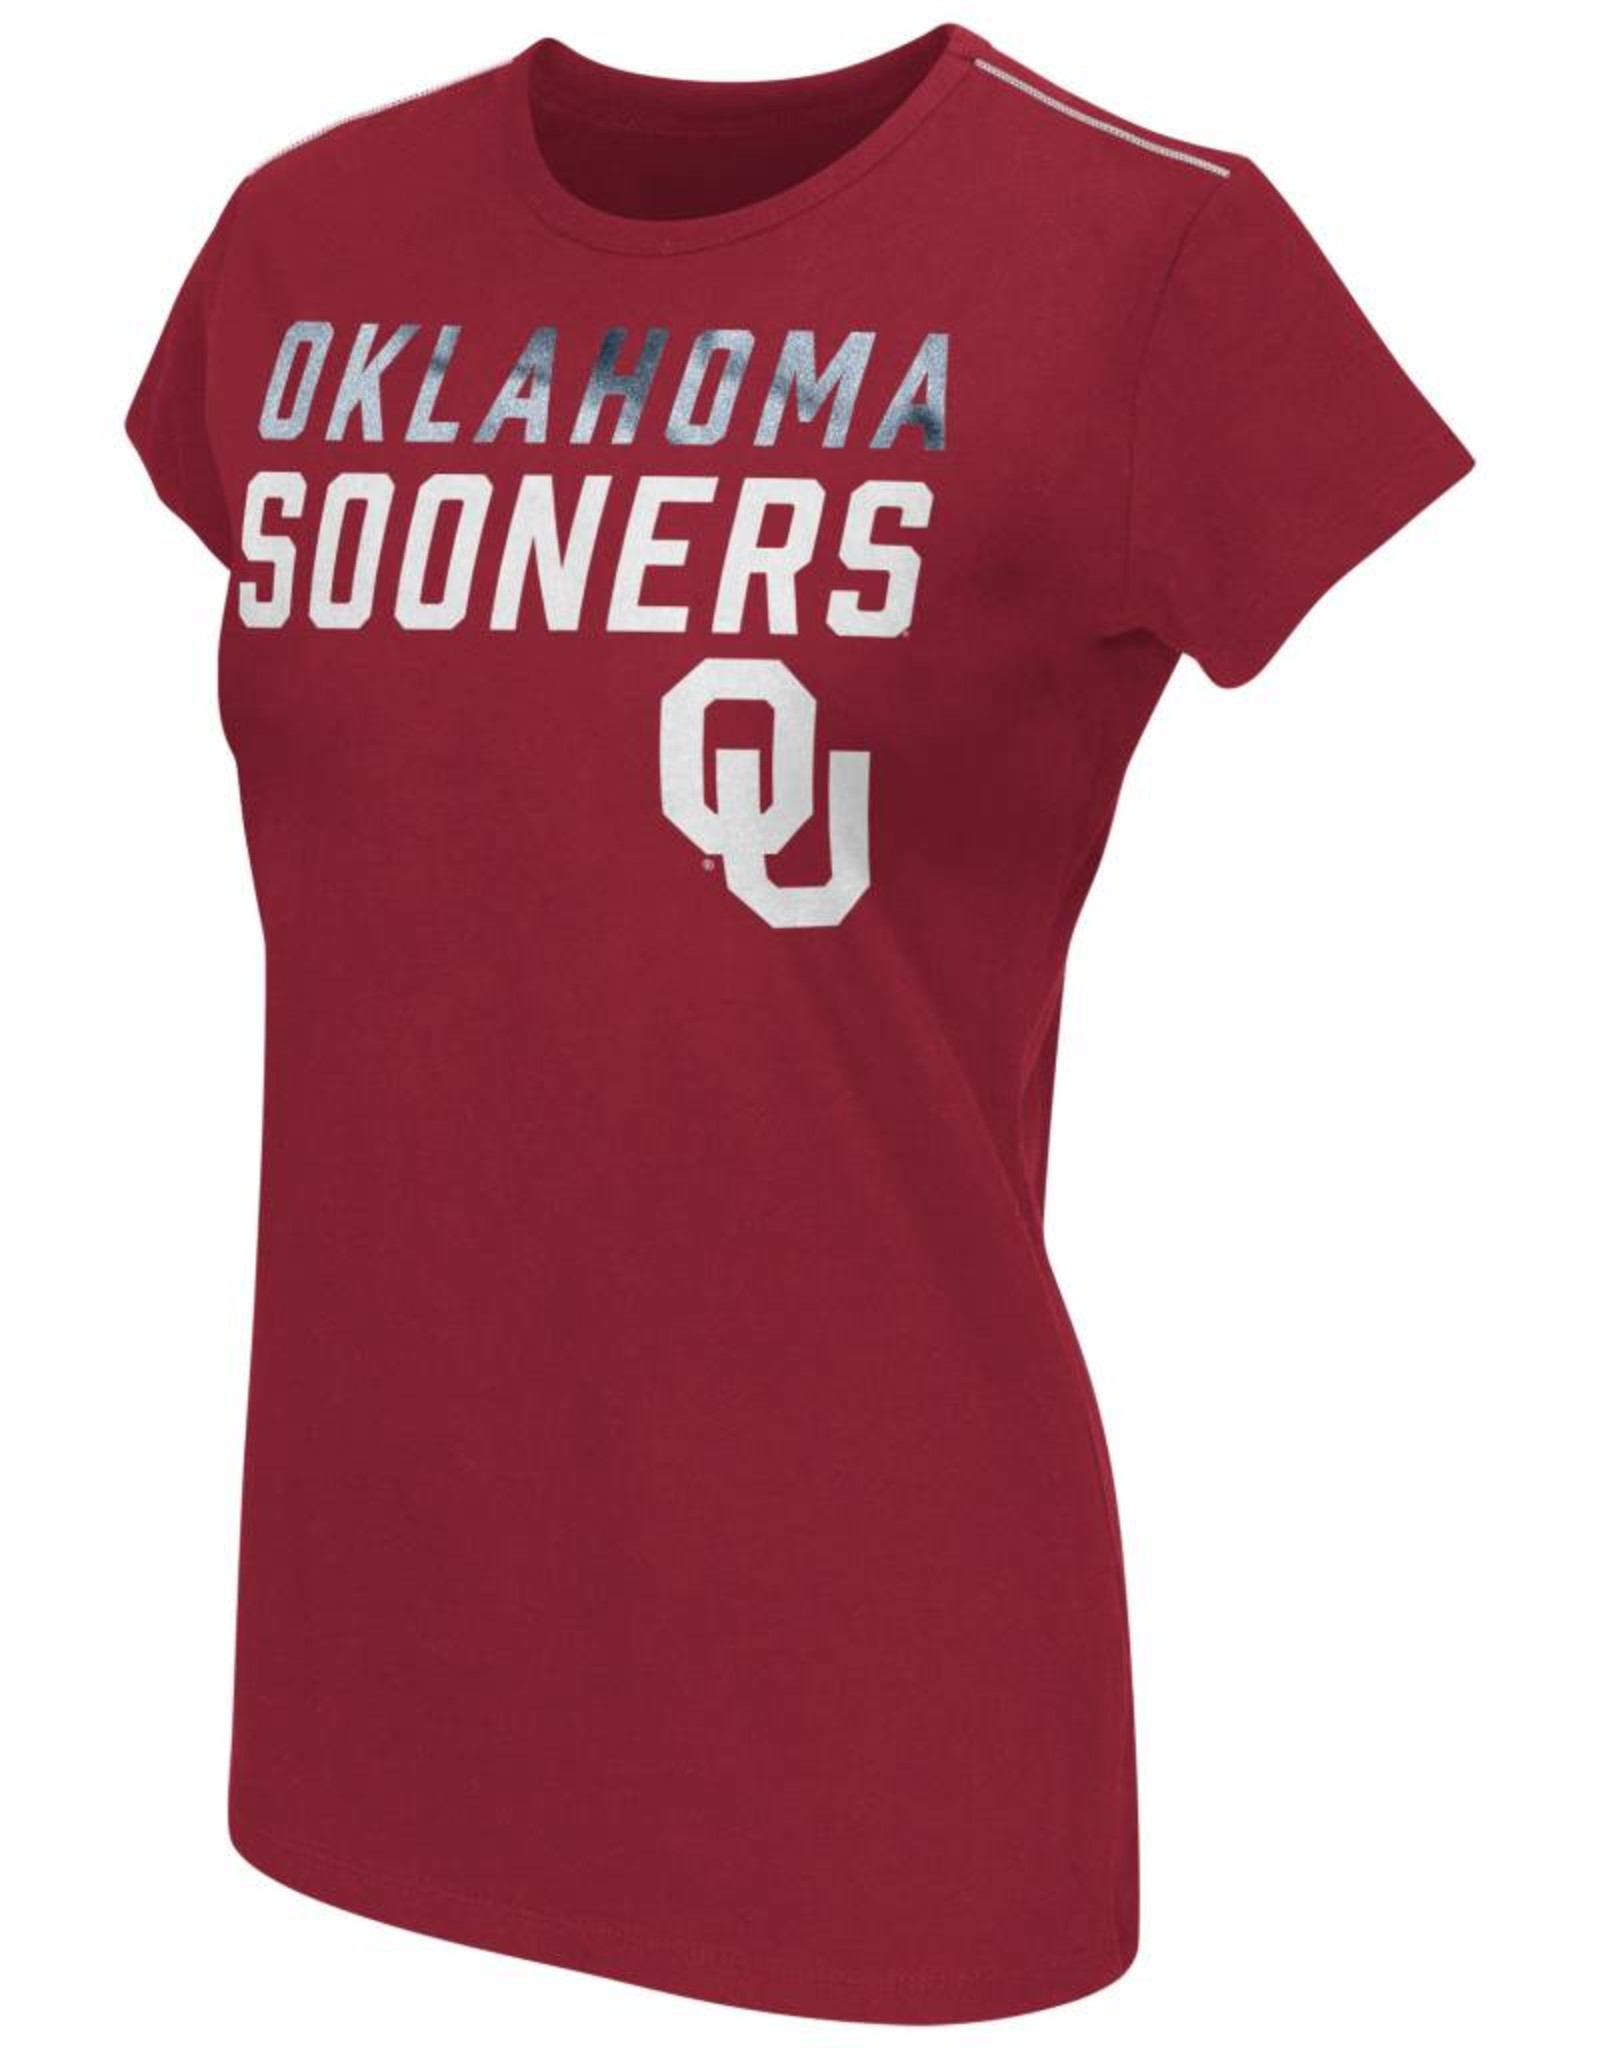 G-III 4 her Women's Oklahoma Sooners Foil Champion Tee